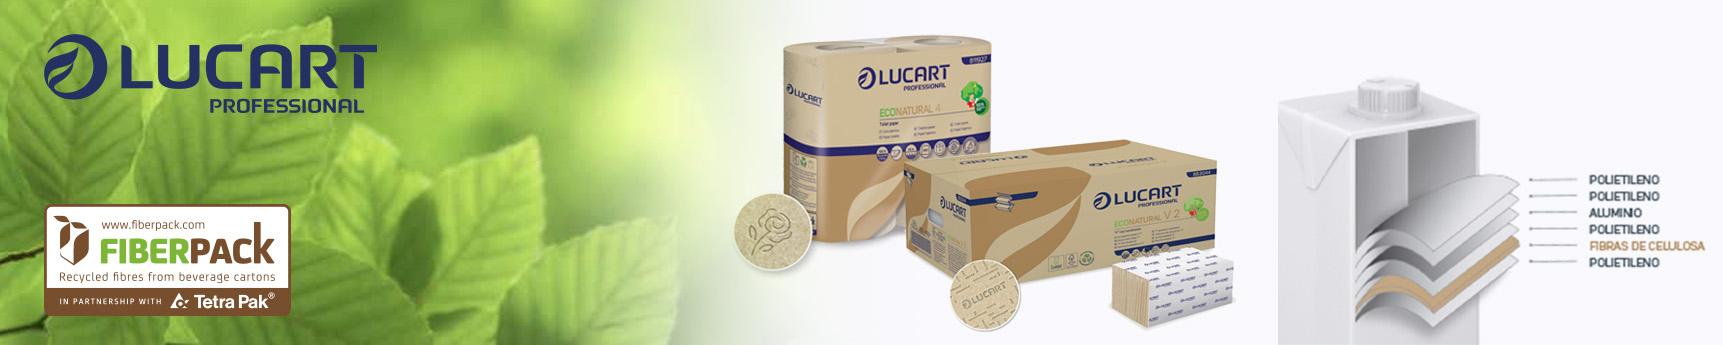 Papel ecológico Lucart fabricado a partir de materiales reciclados - Interclym